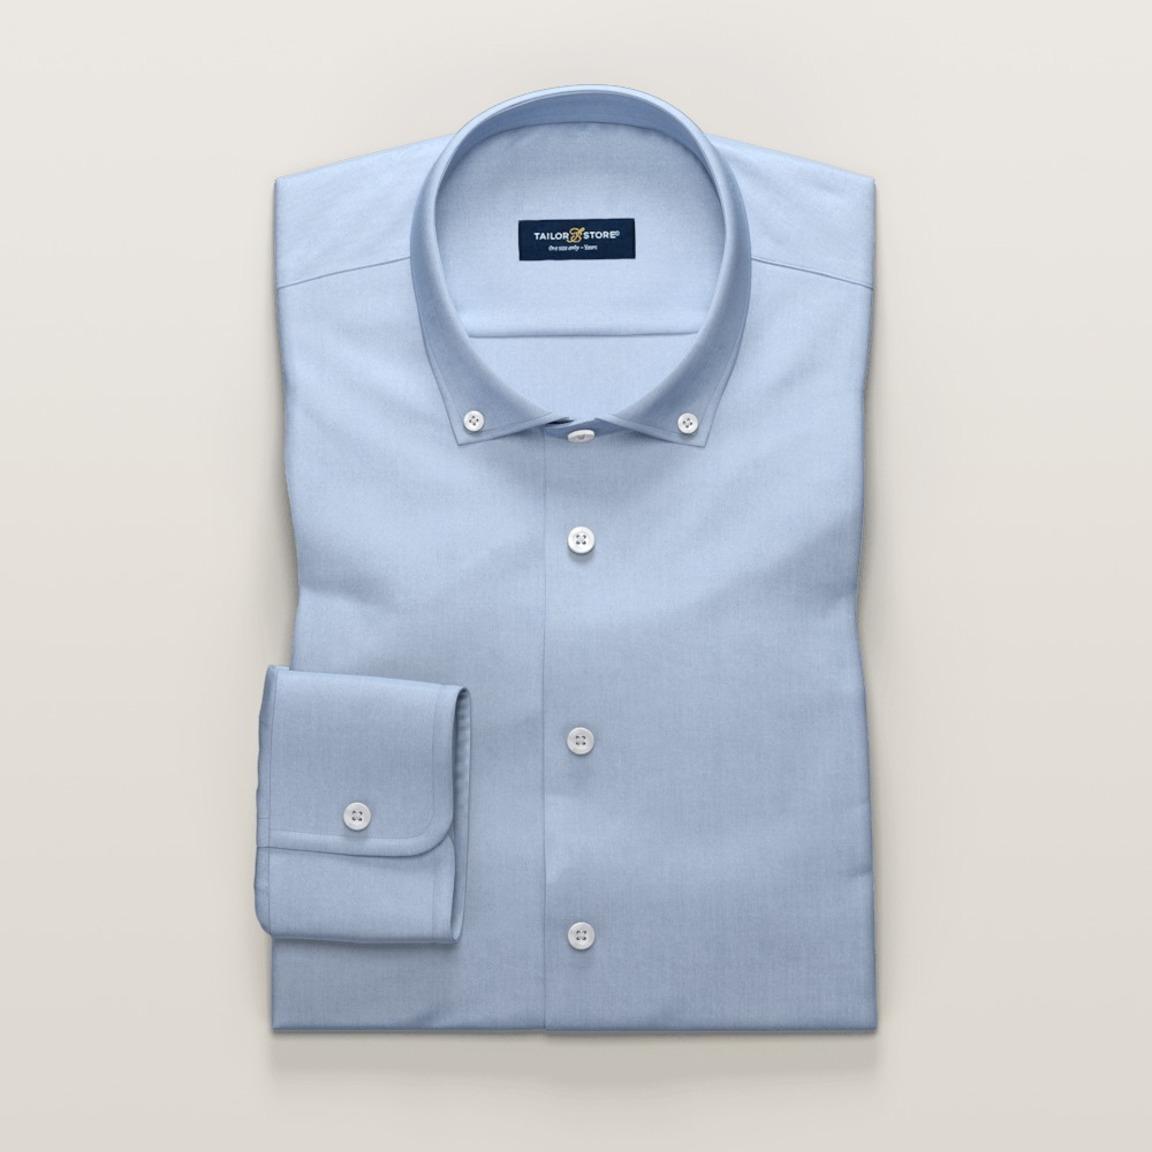 Hellblaues Hemd aus Baumwoll-Tencel-Twillstoff